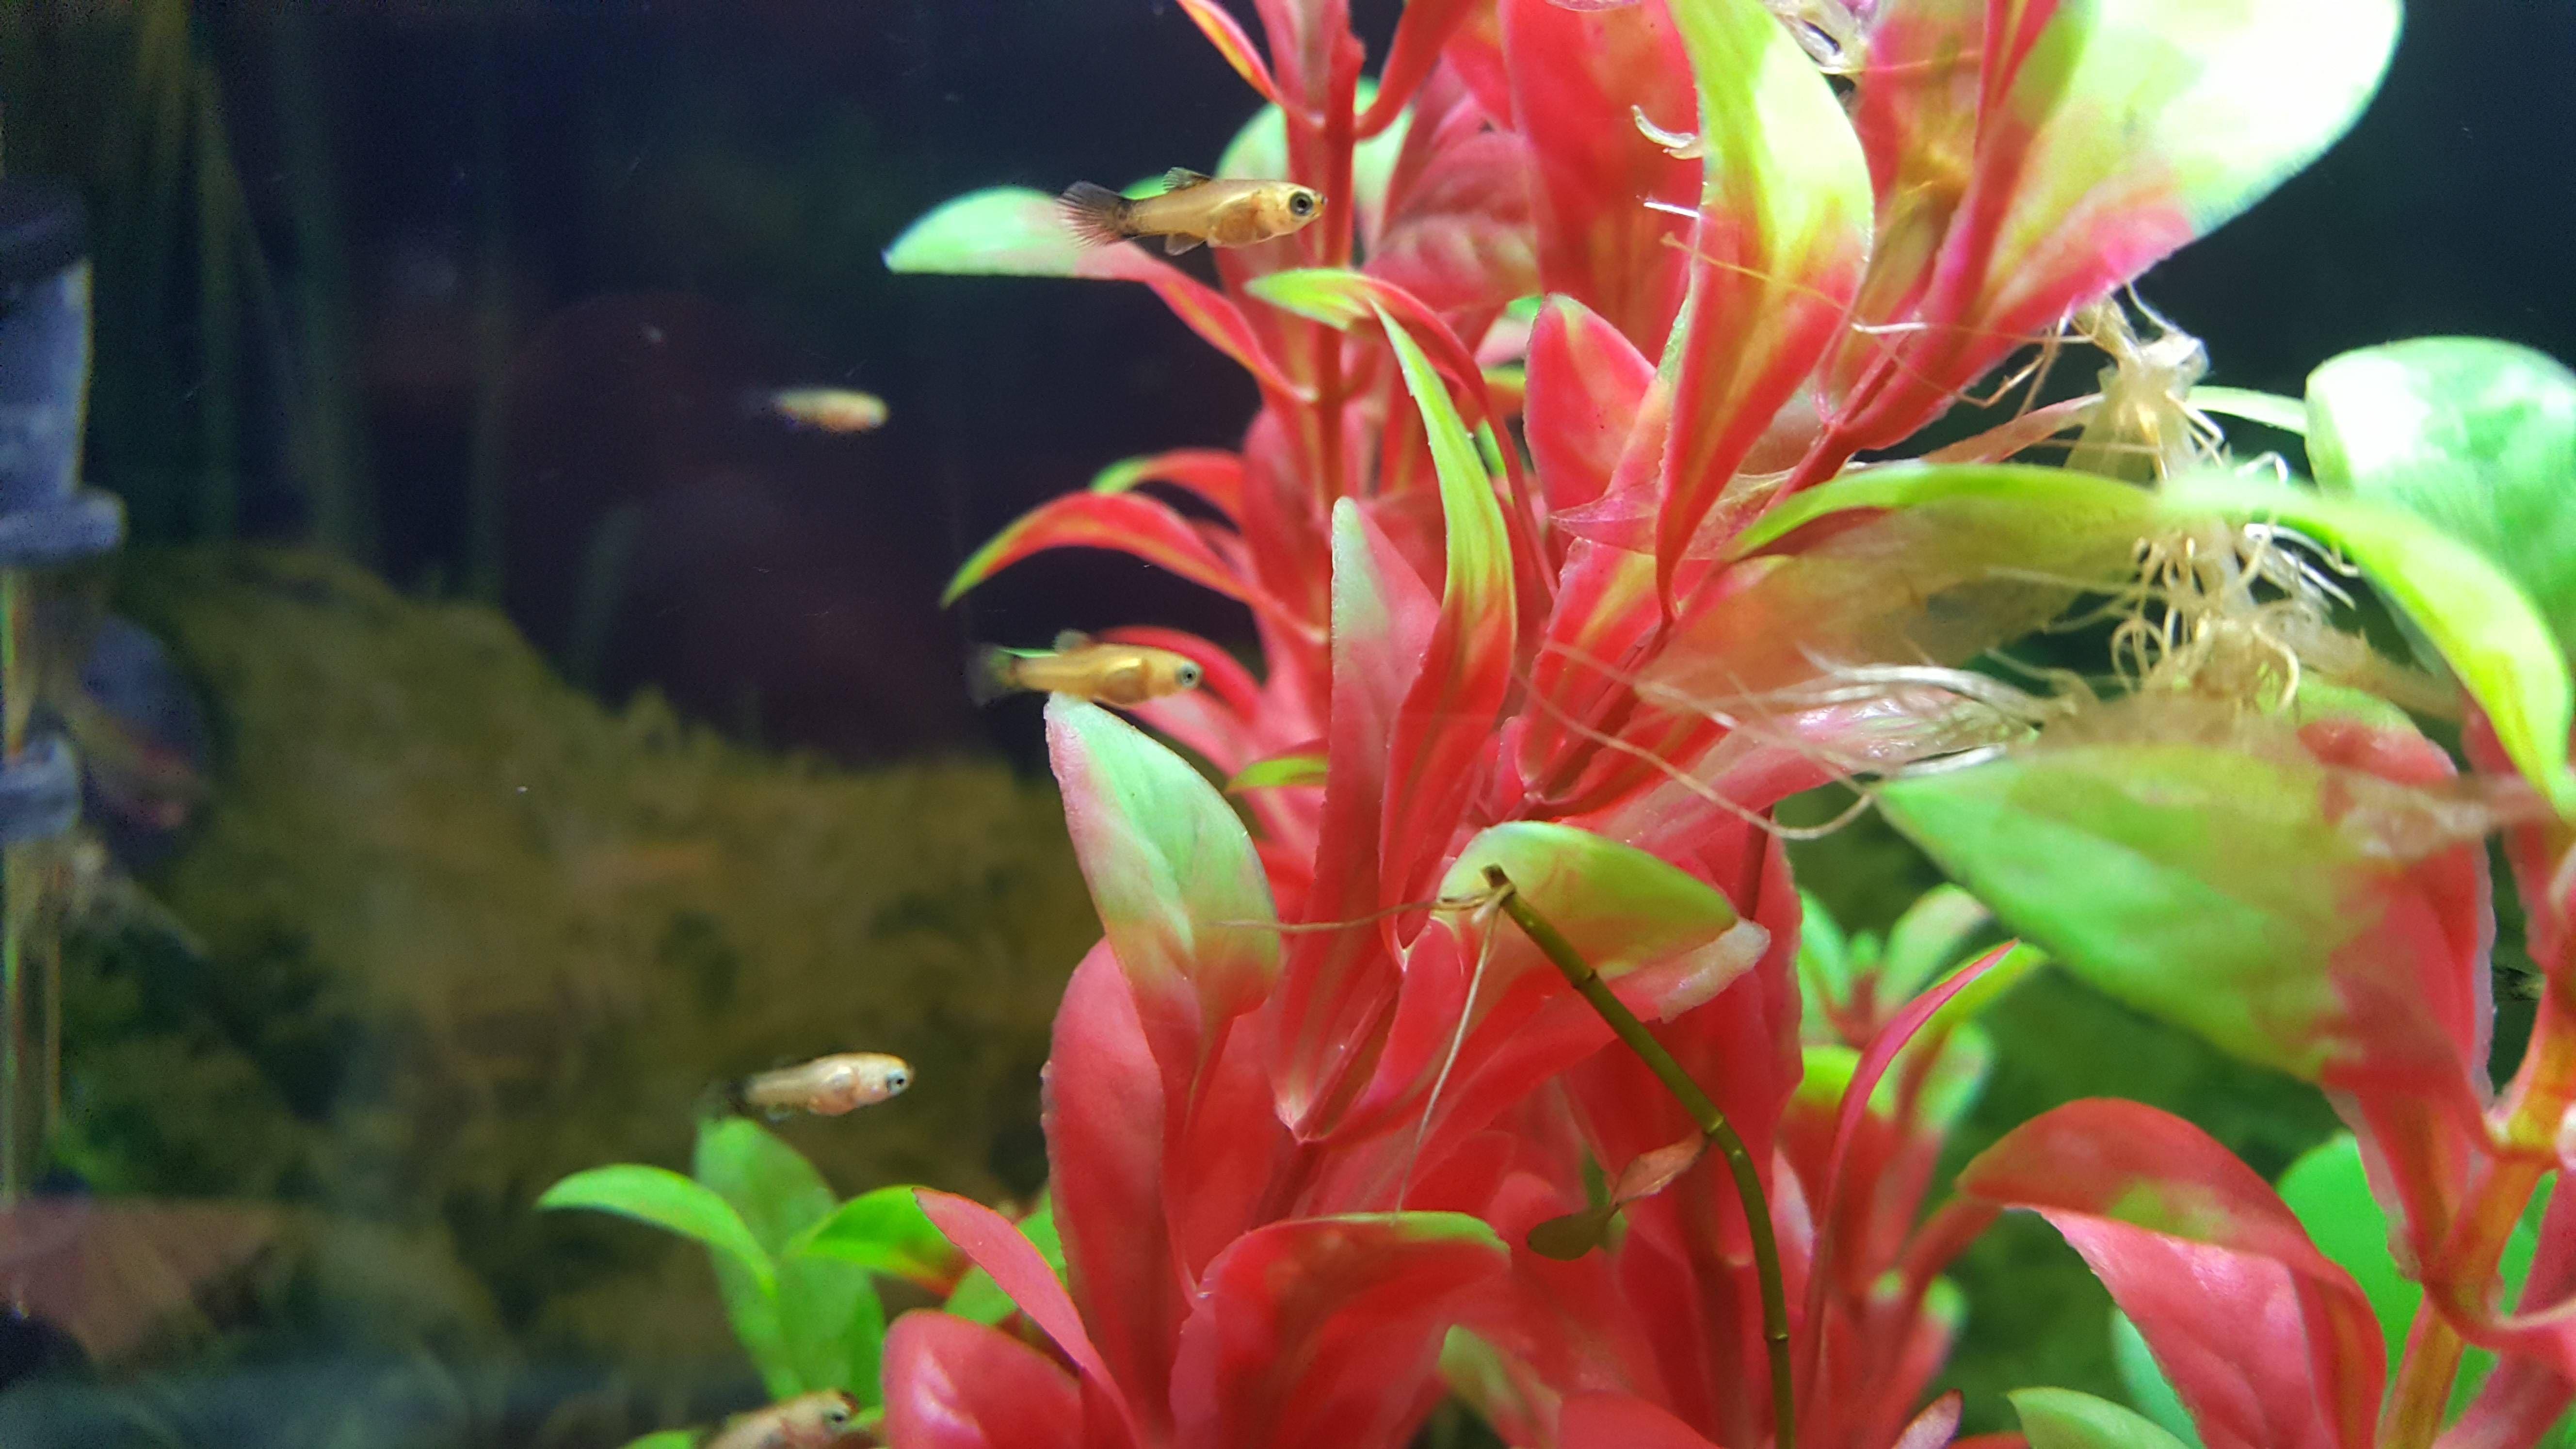 My adorable sunburst platy fry. | Aquariums | Pinterest | Aquariums